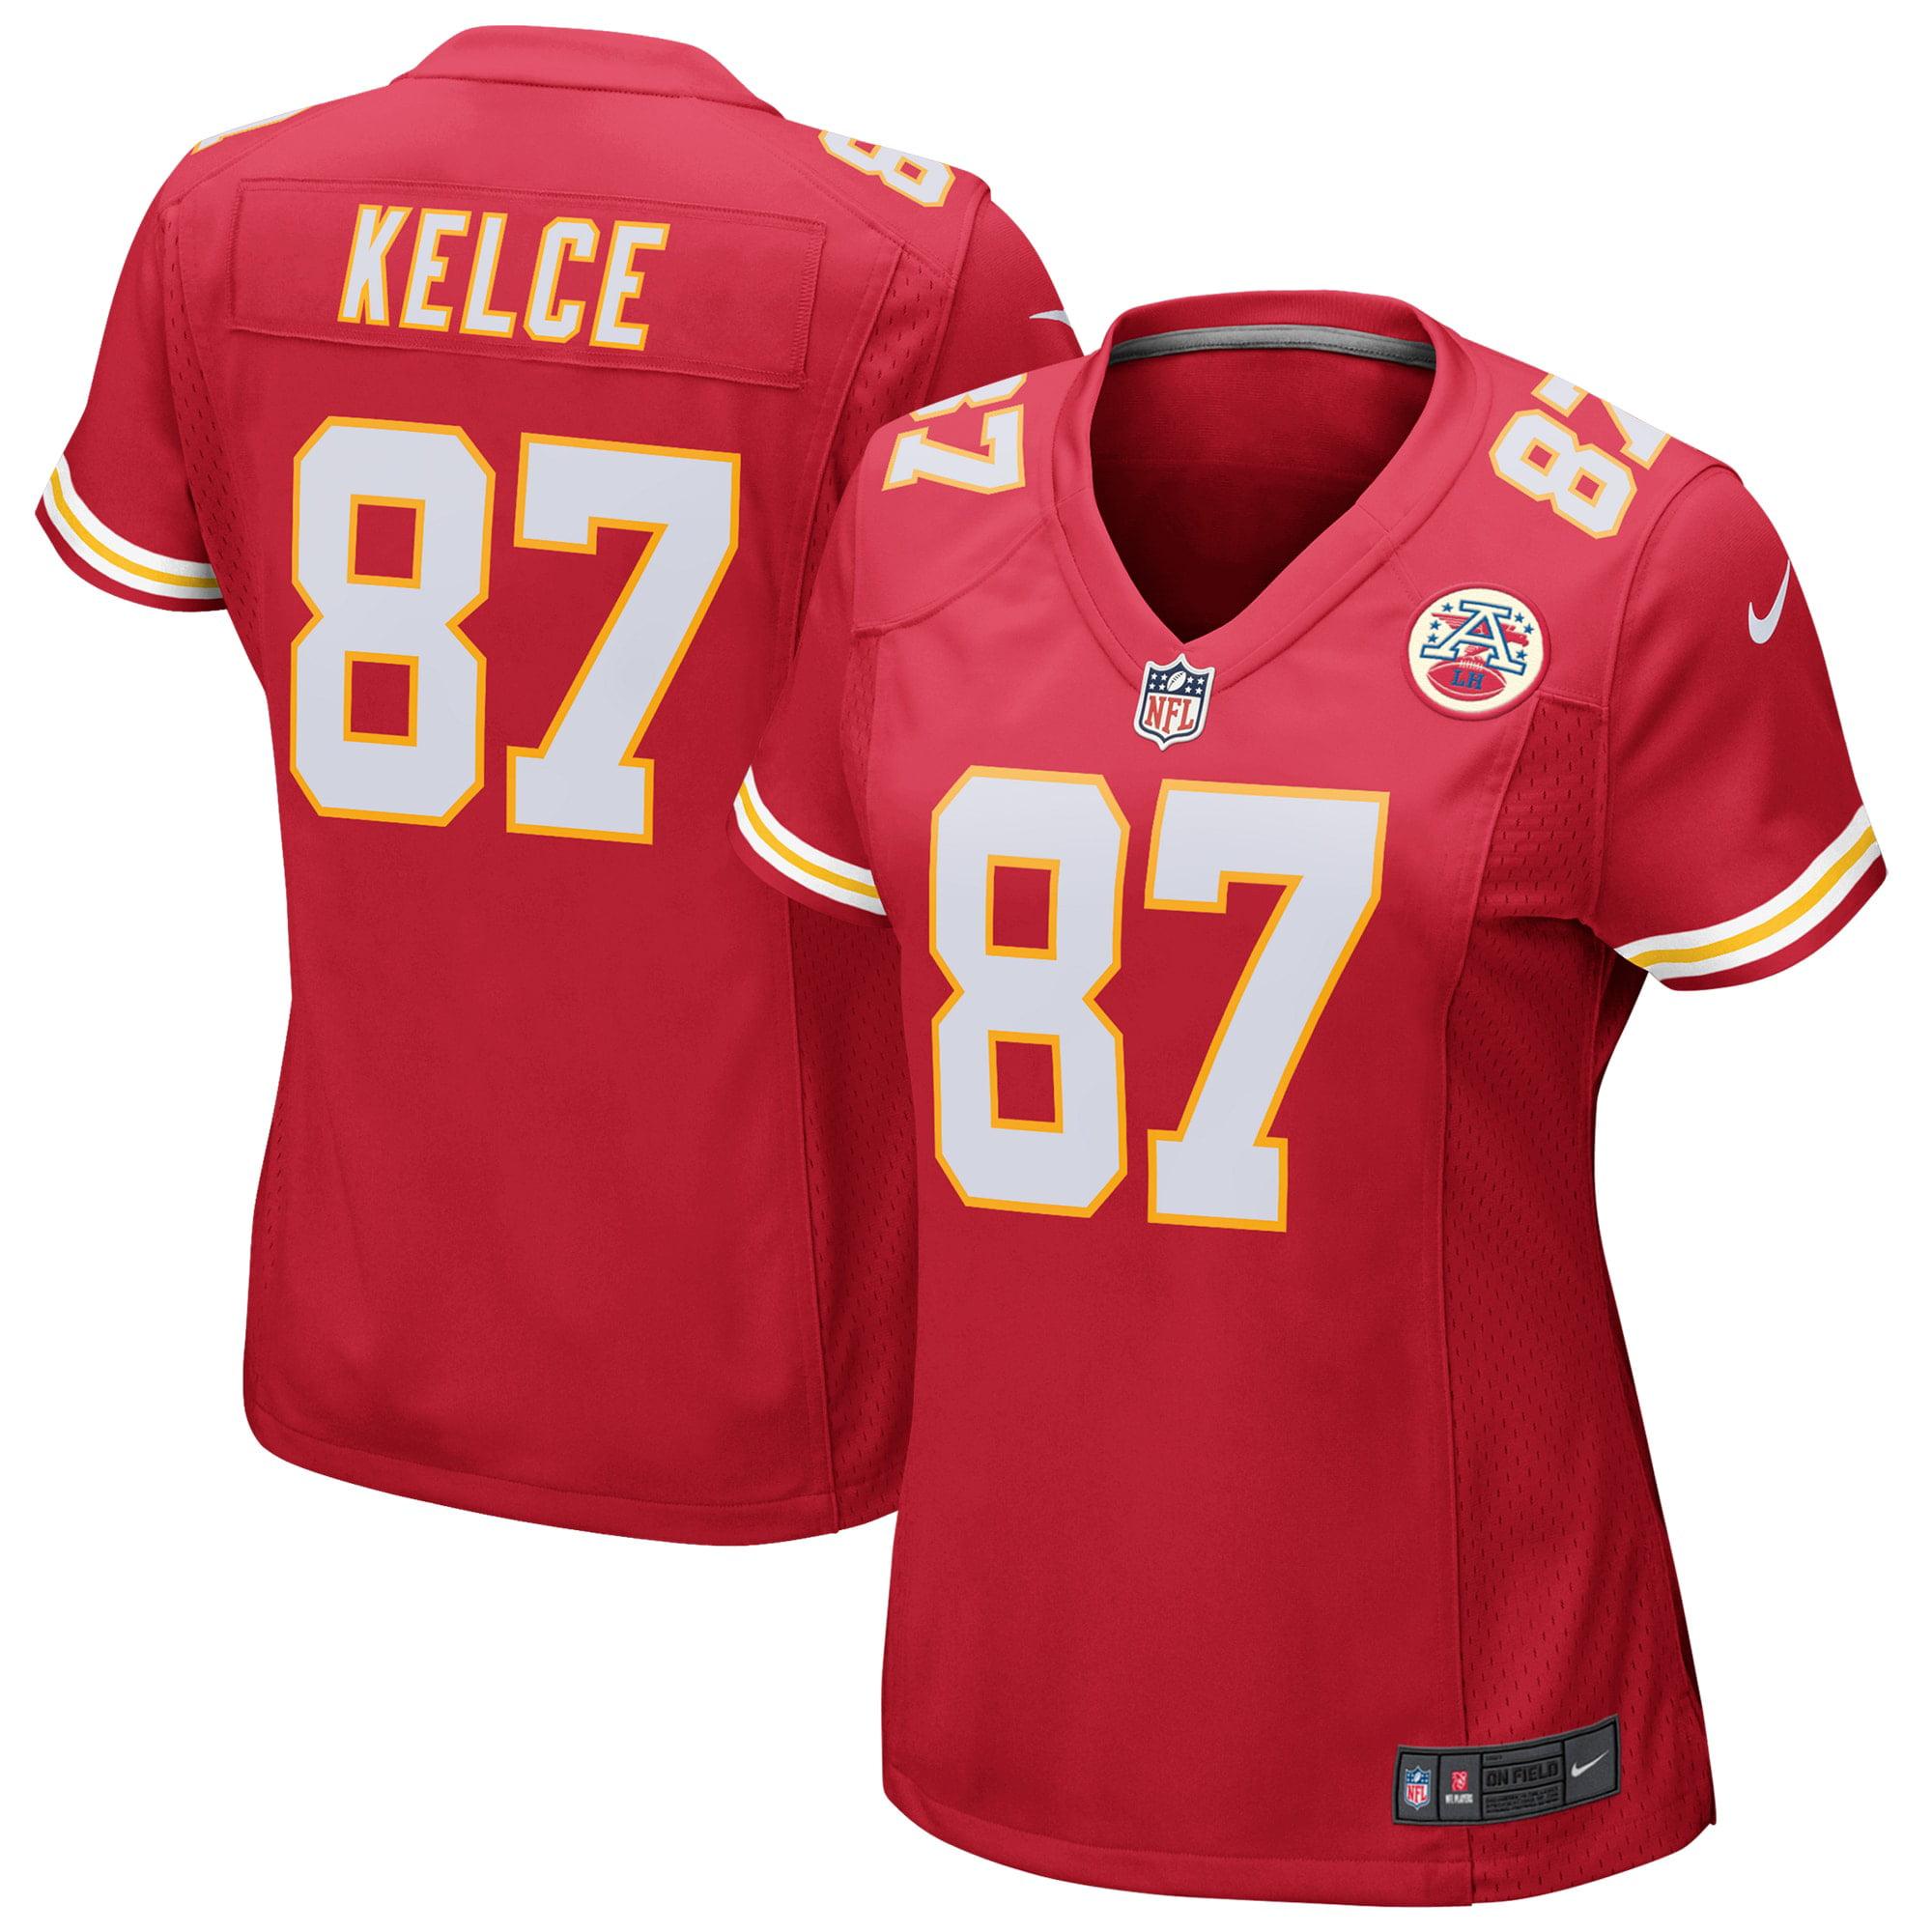 Travis Kelce Kansas City Chiefs Nike Women's Game Jersey - Red - Walmart.com